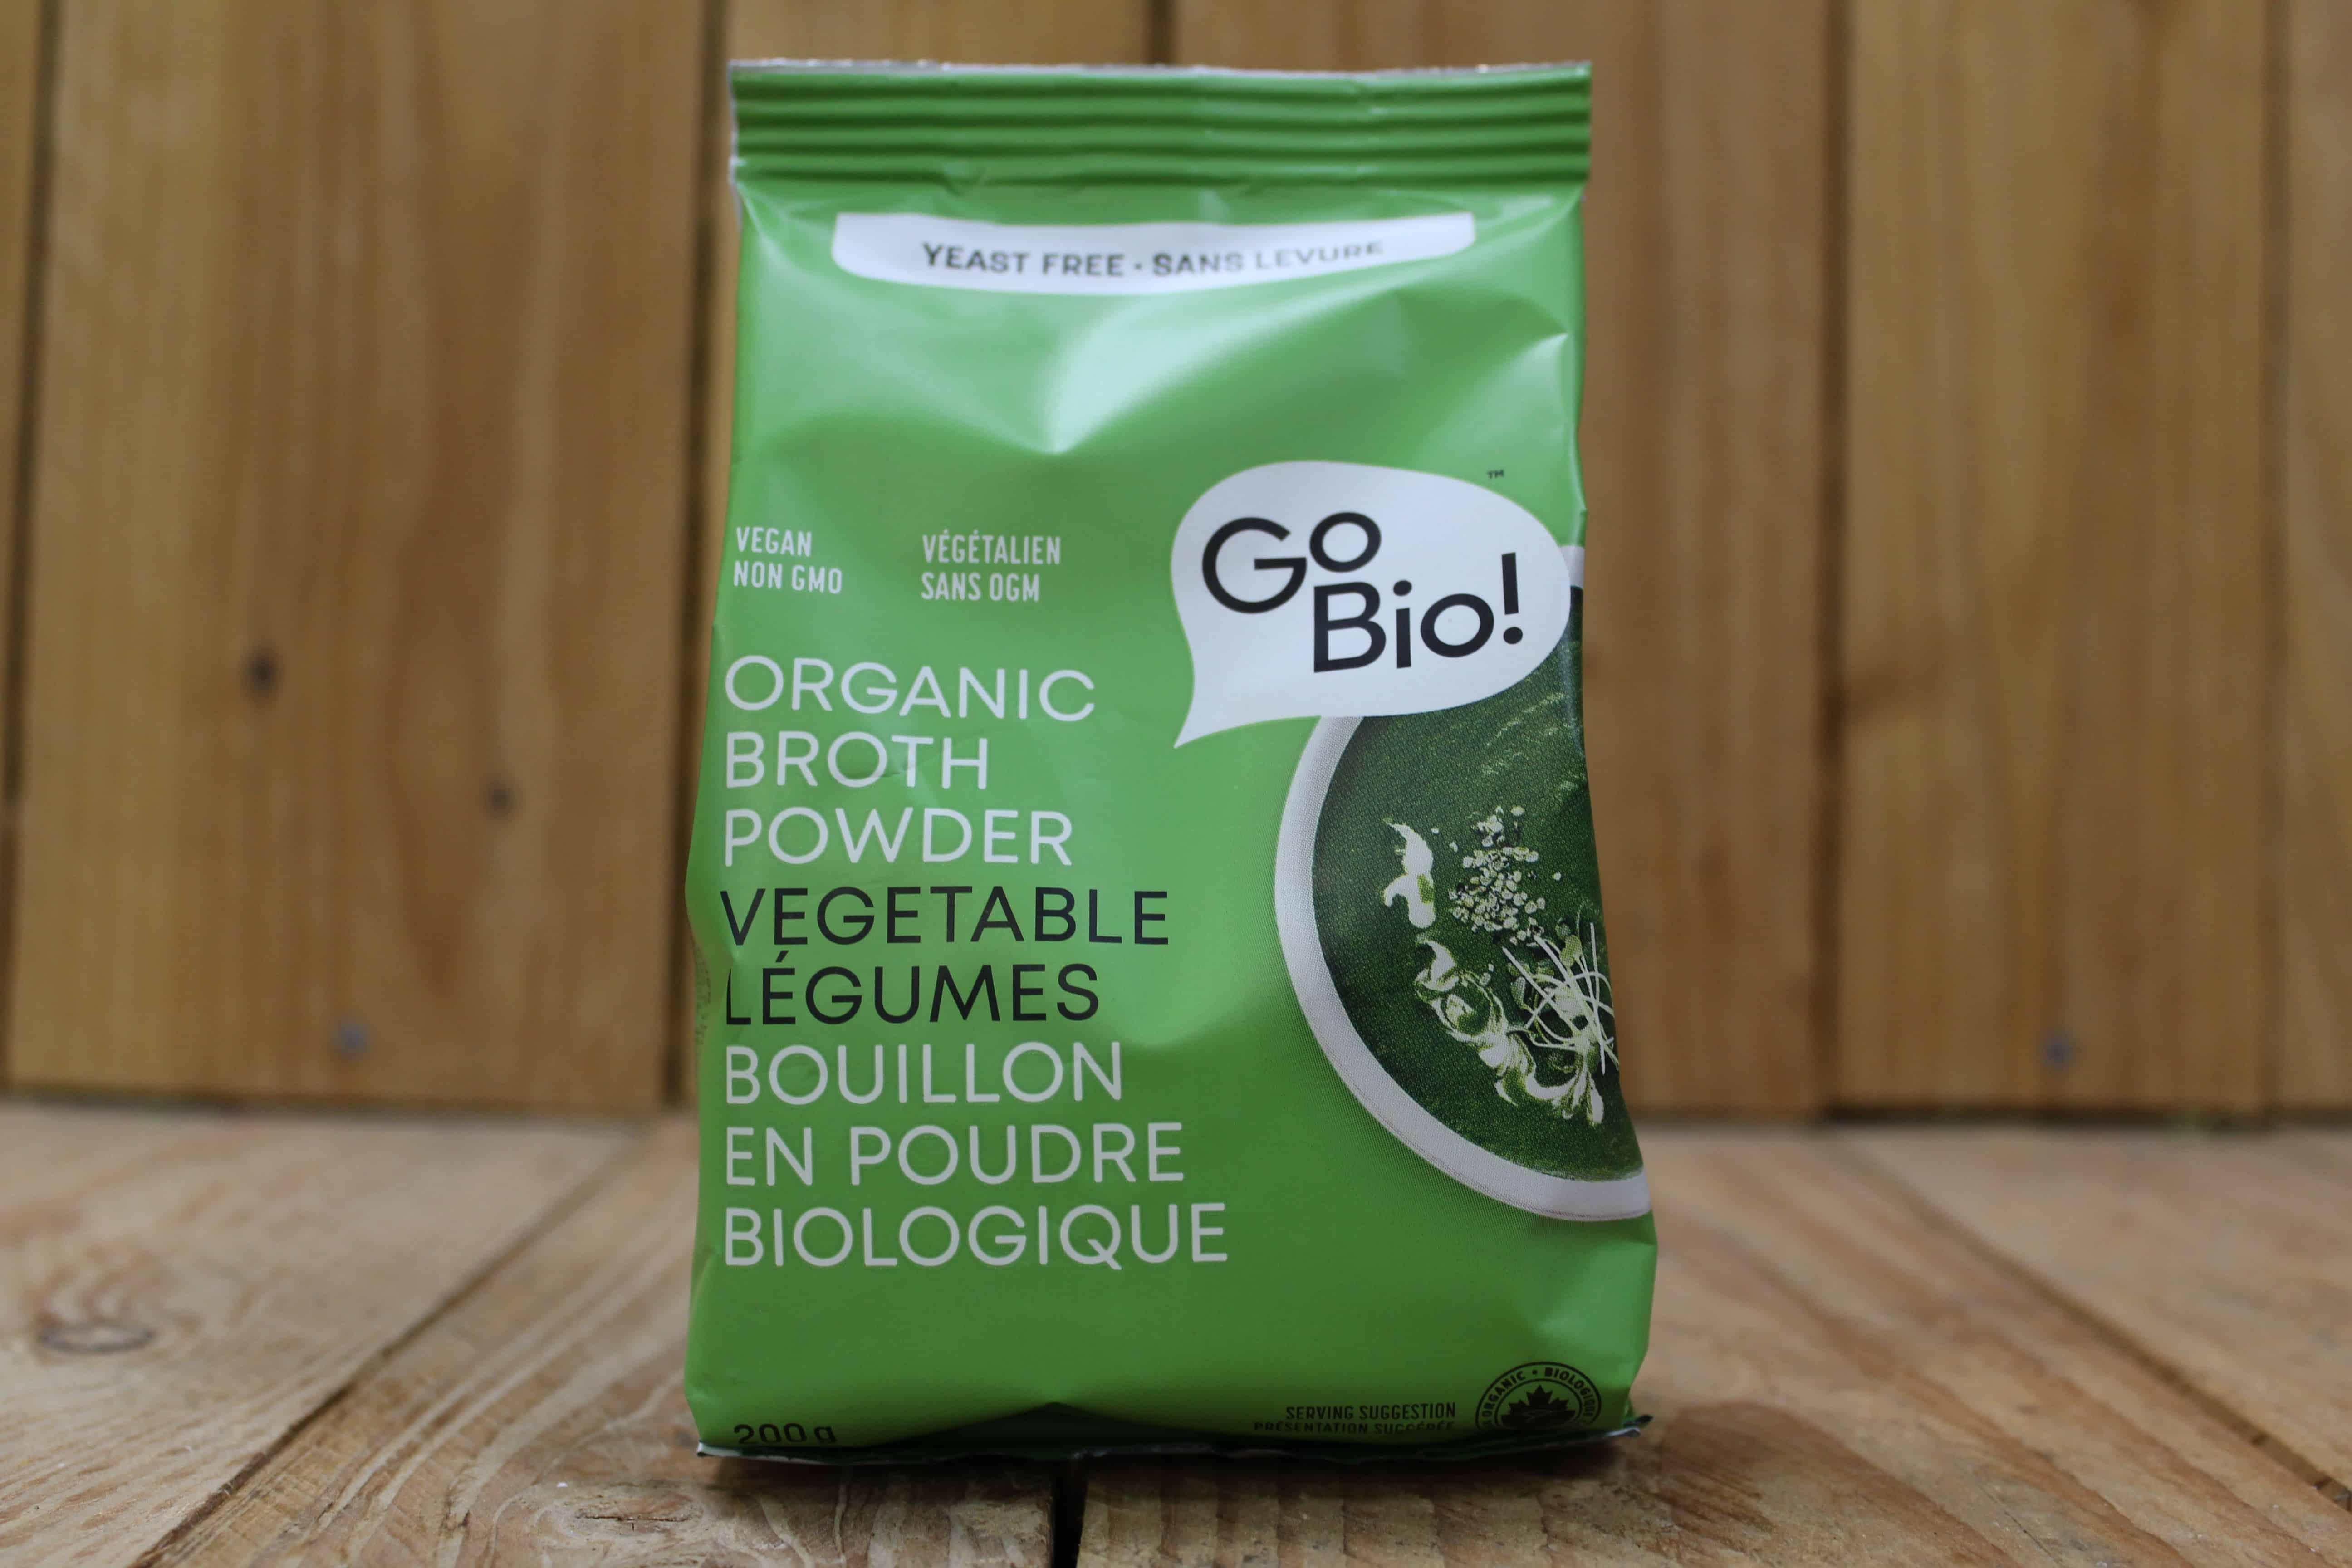 GoBio! – Vegetable Broth Powder (Yeast-Free) (200g) *Best Before March 1st